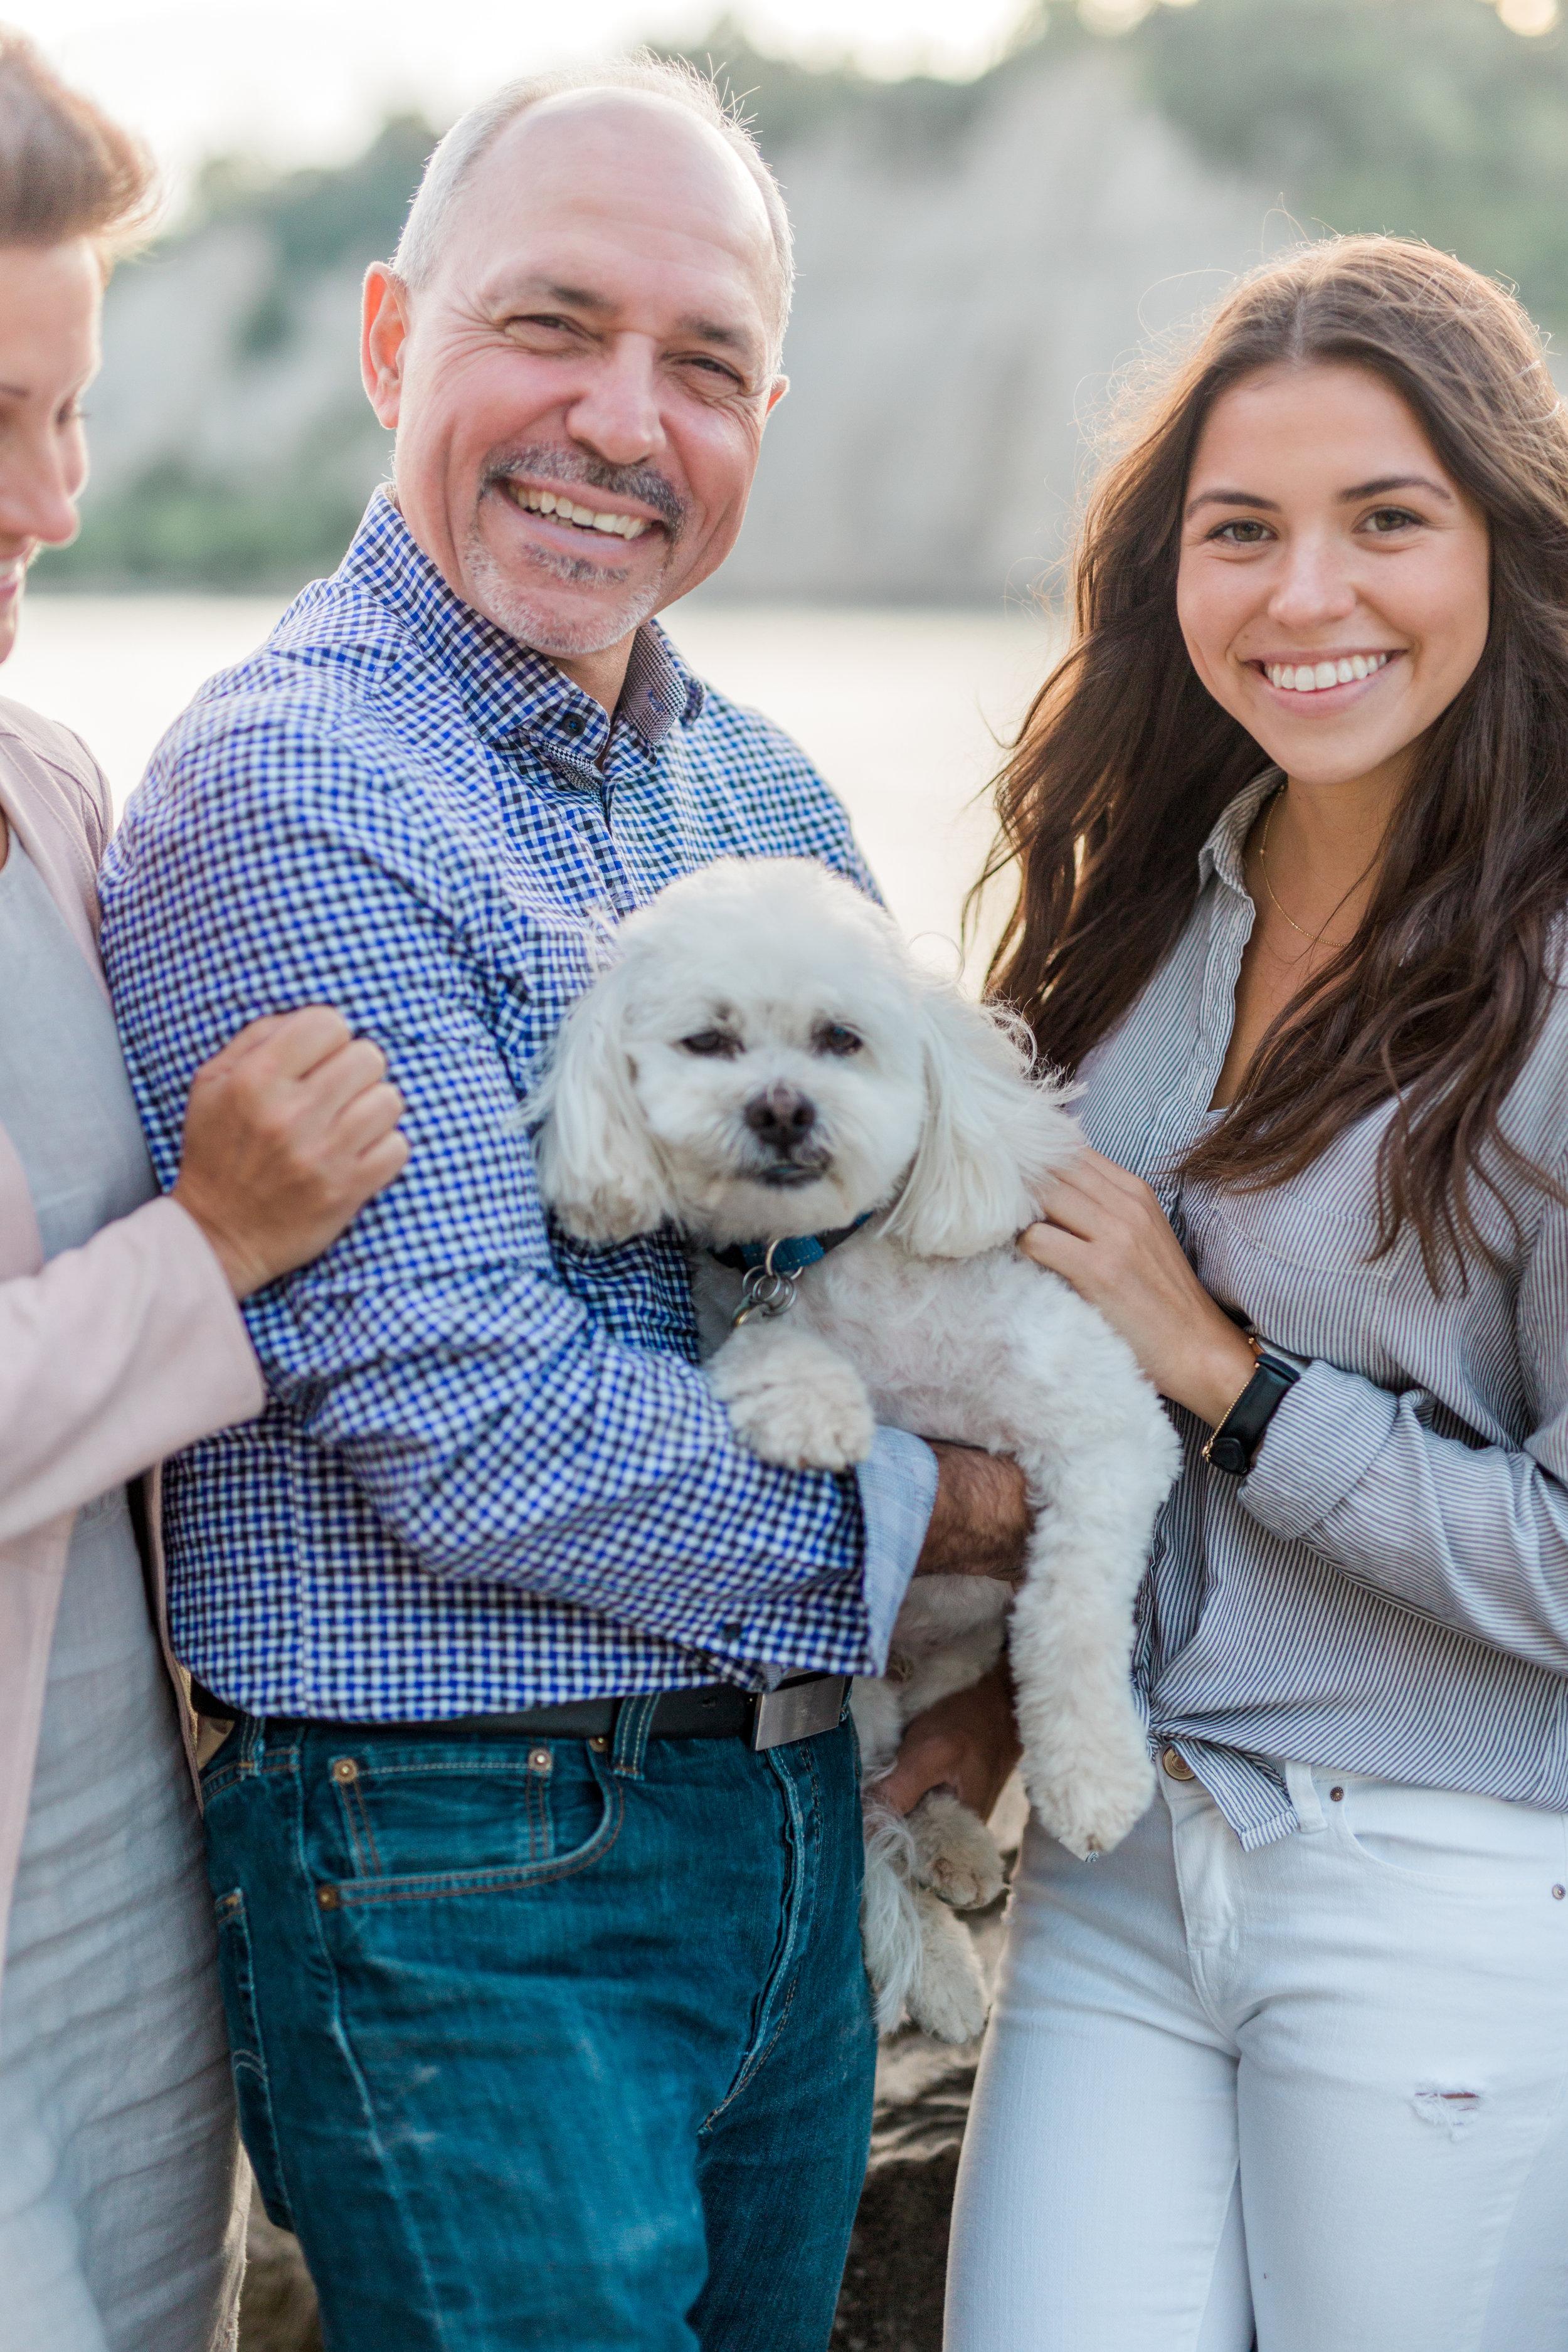 Danielle-Giroux-Amir-Golbazi-Genua-Family-Photography-Scarborough-Bluffs-9379.jpg